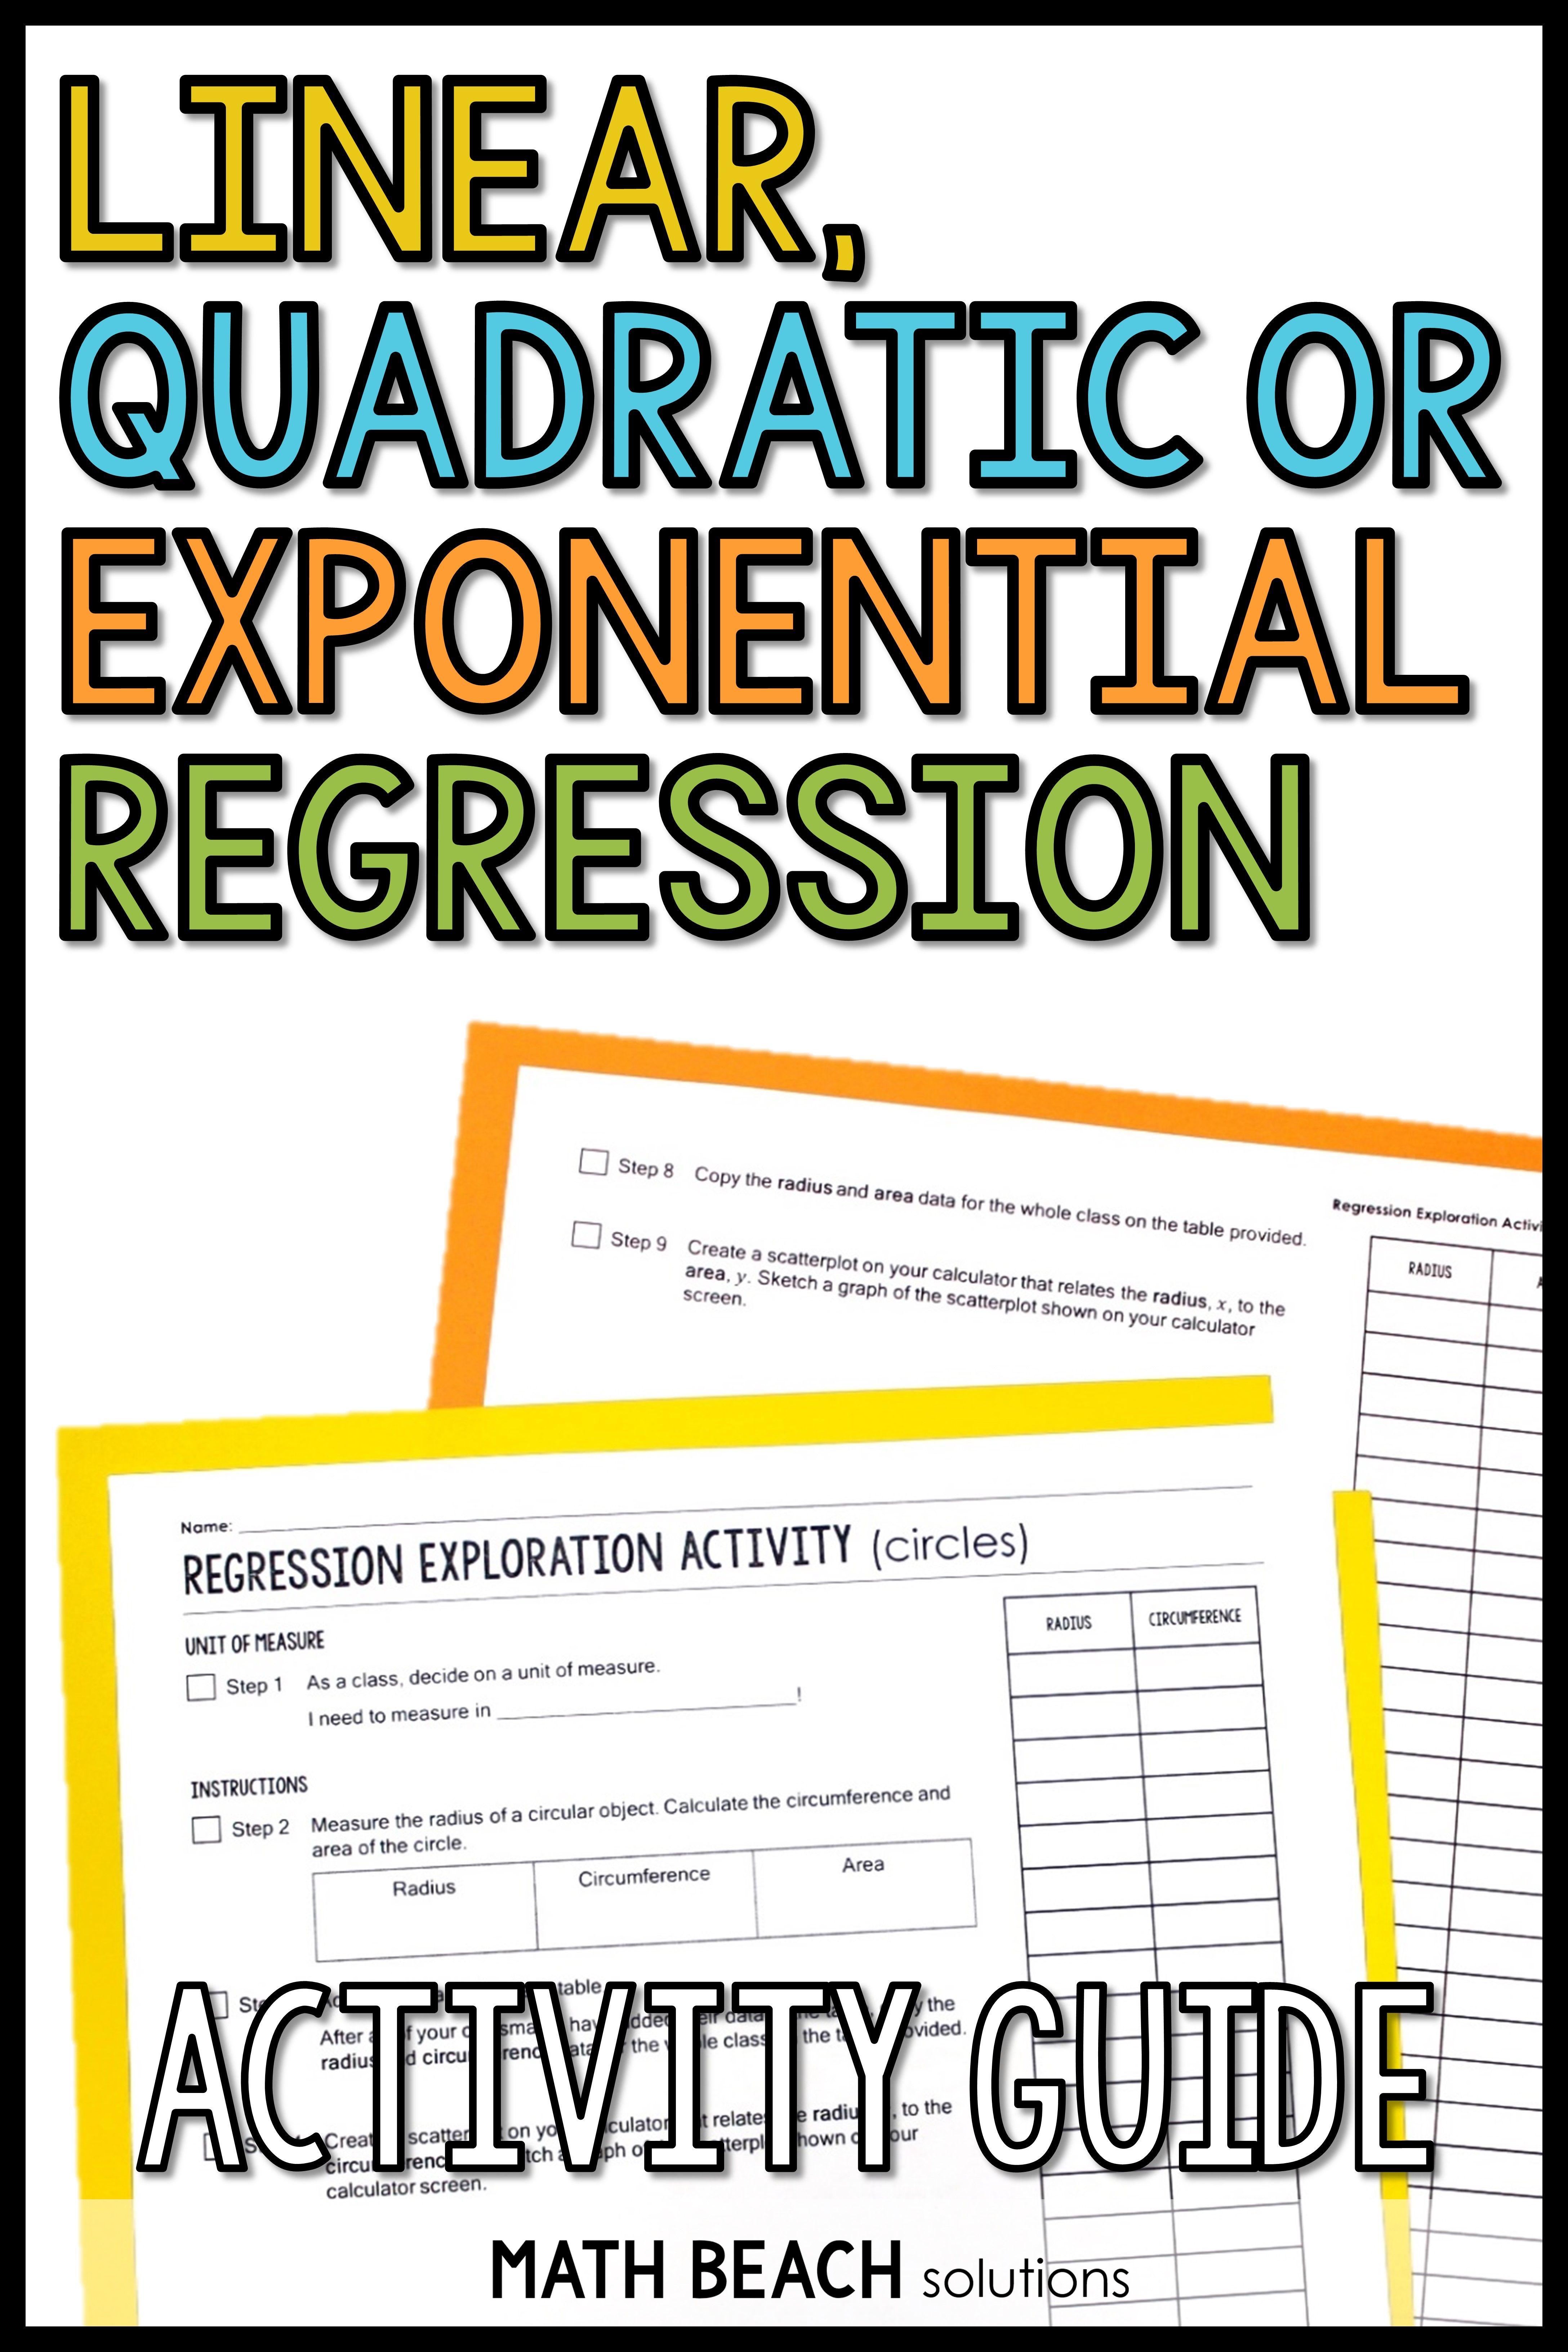 Regression Activity Guide Quadratics Algebra Resources Exponential